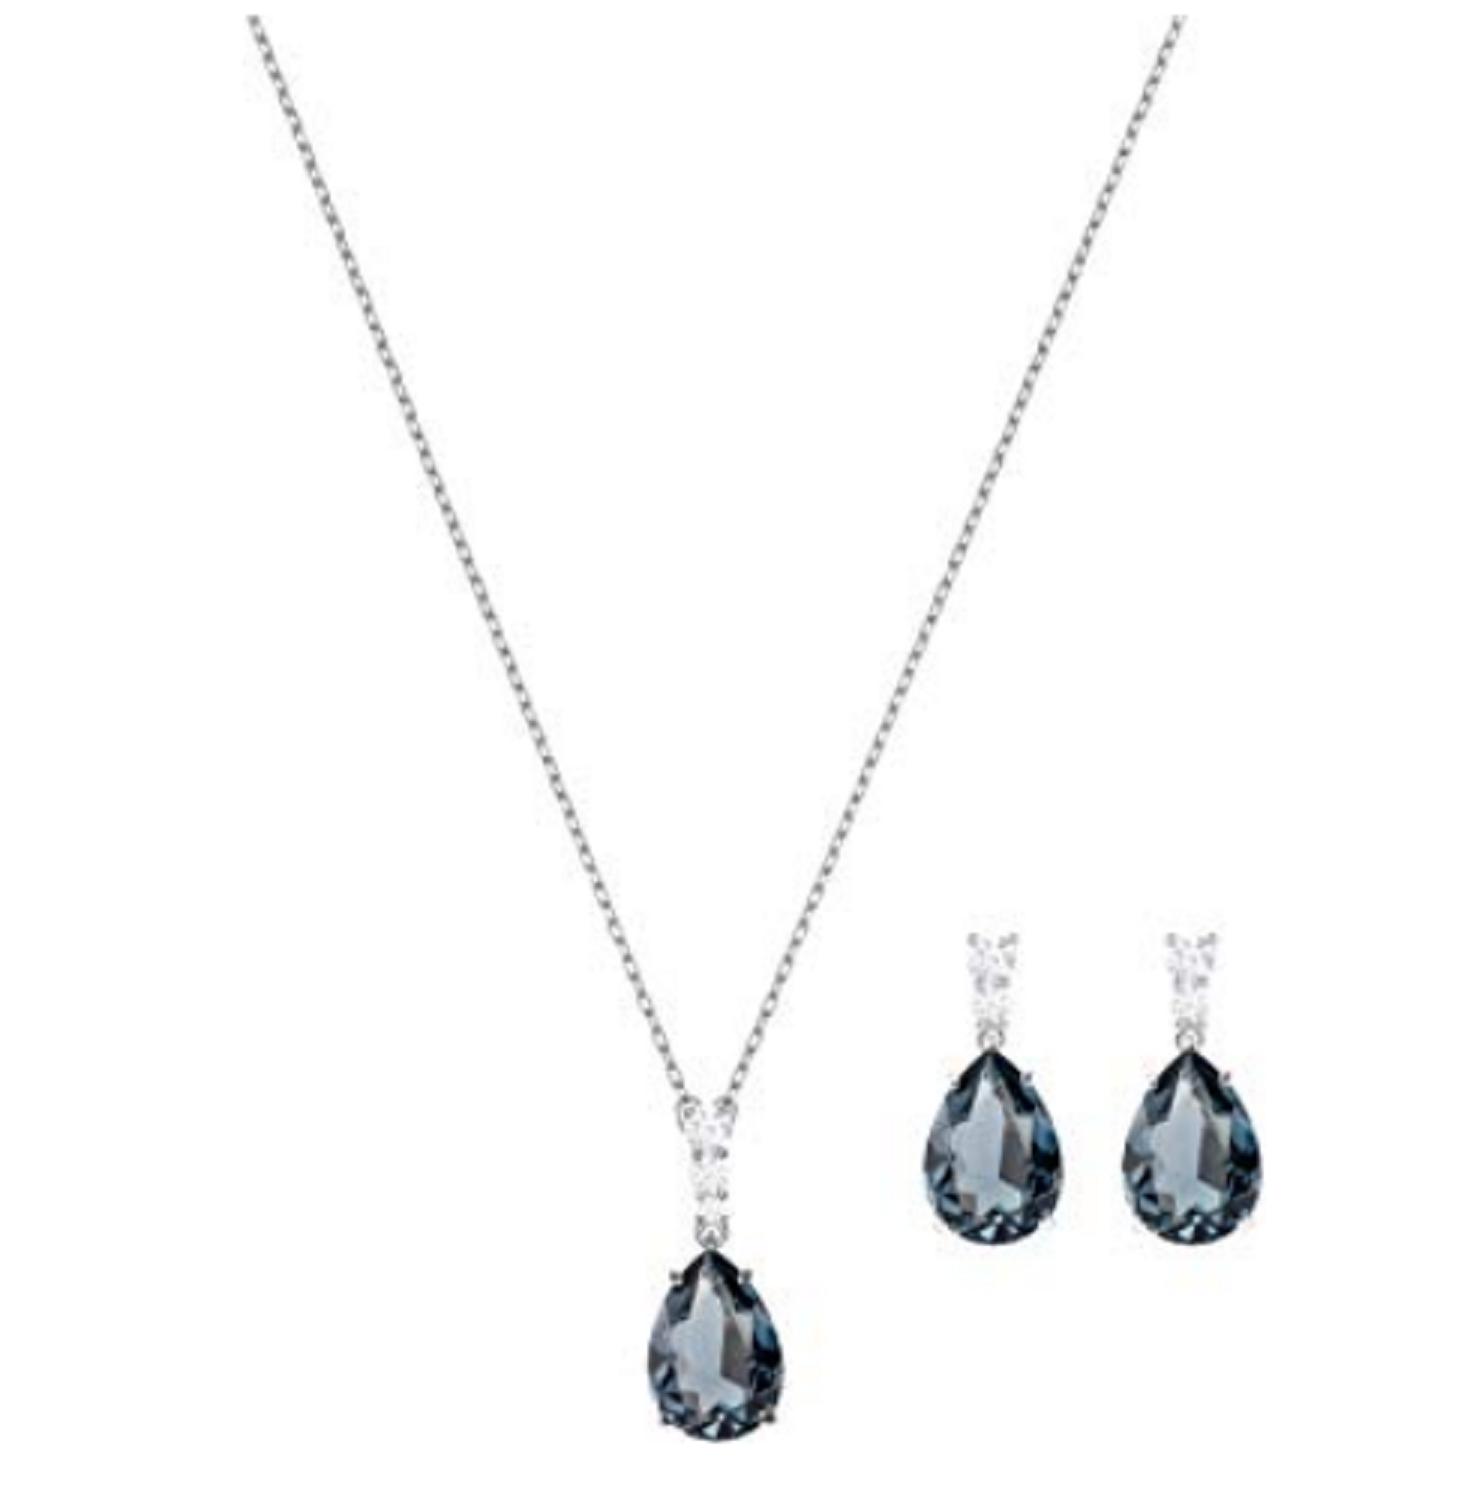 Swarovski Set Vintage, Coated Of Rhodium, Glass Green Azulado. Length 15in - $297.06